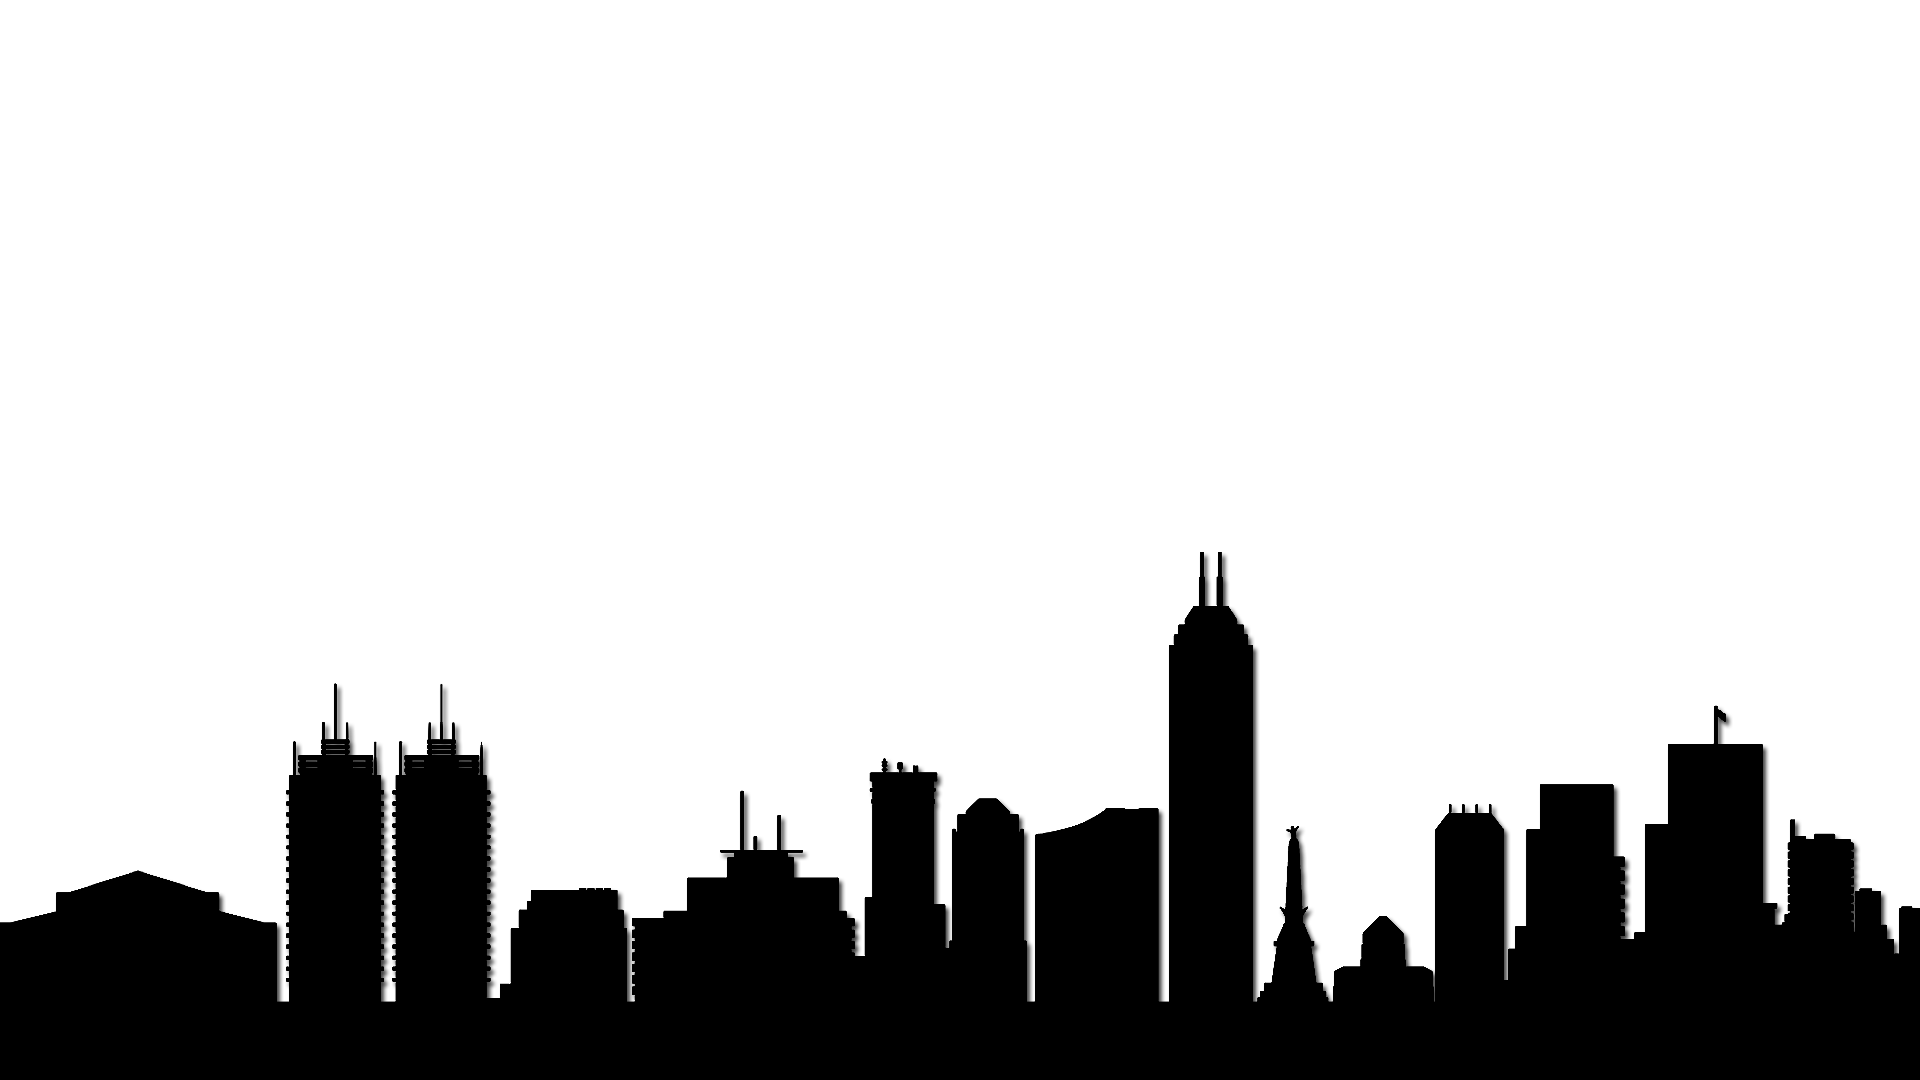 1920x1080 Atlanta Drawing Skyline Indianapolis Transparent Png Clipart